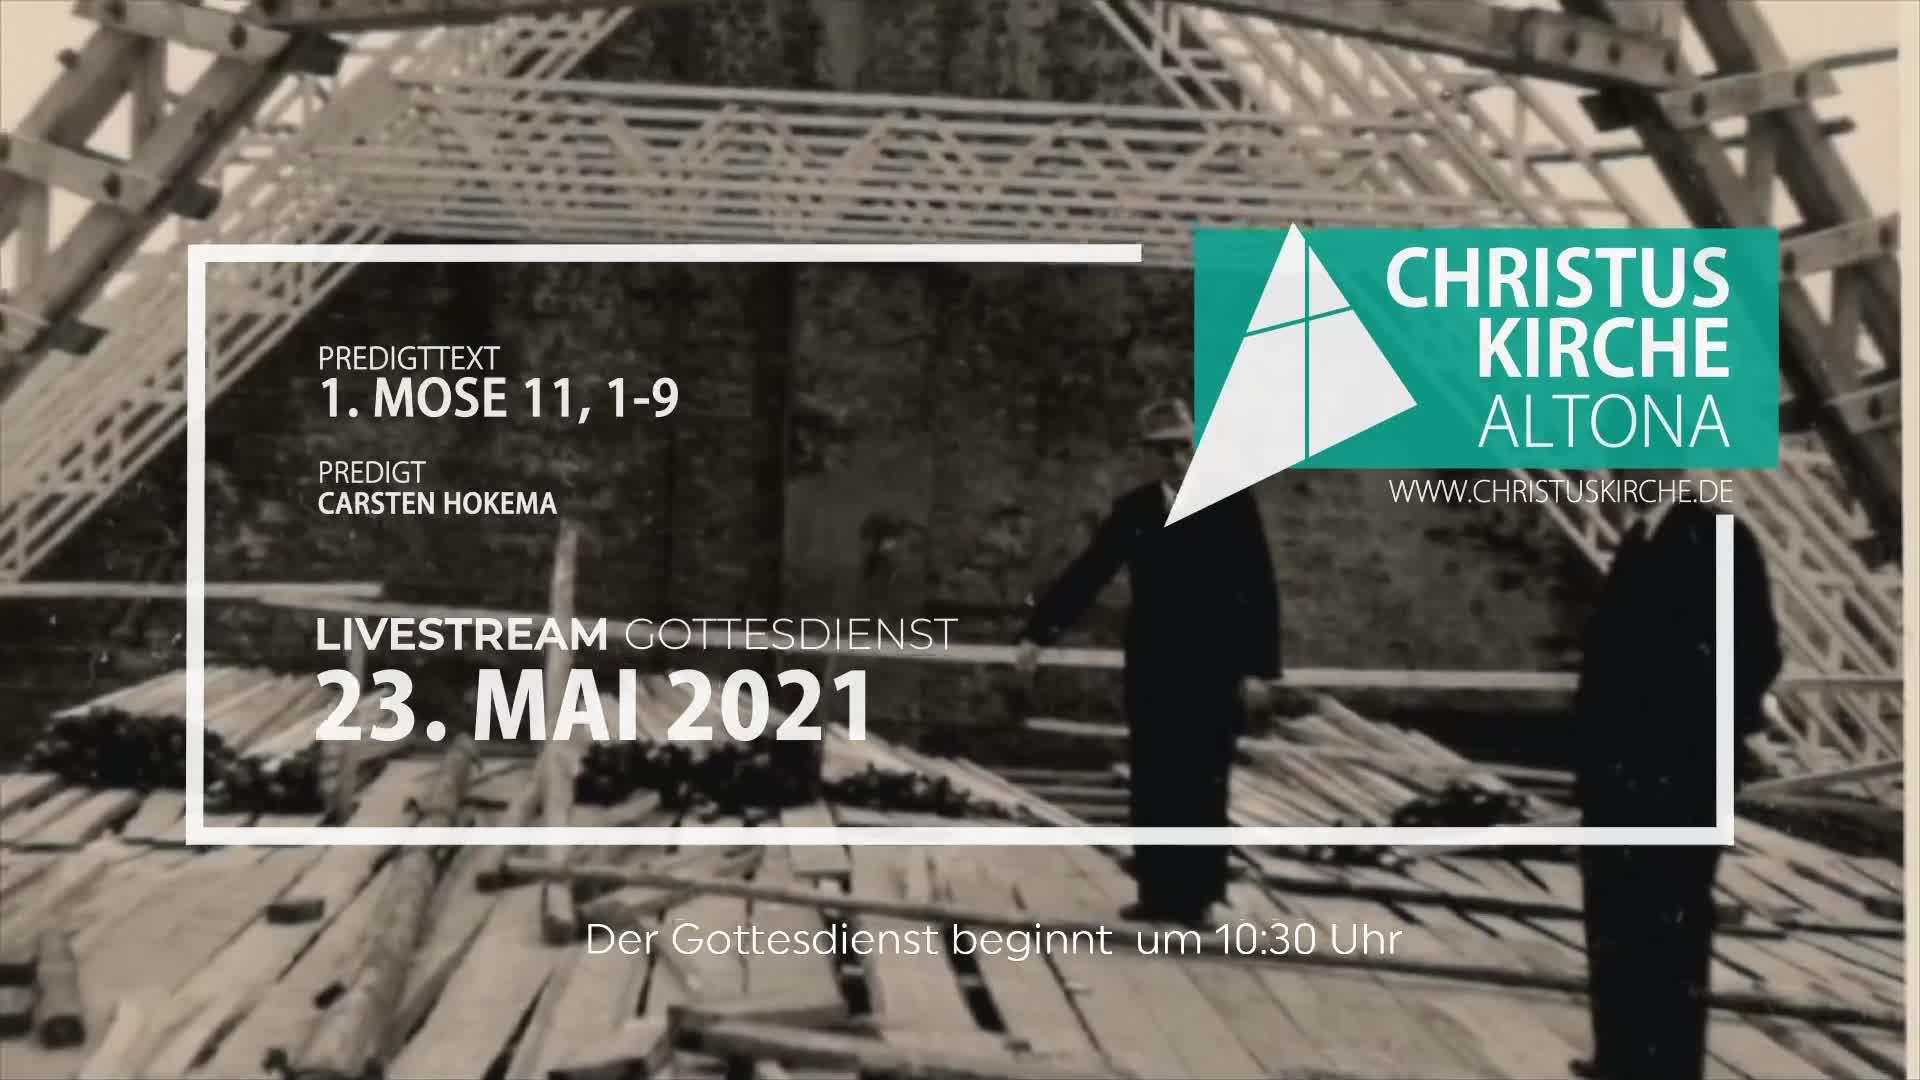 Gottesdienst - am 23. Mai - Livestream aus der Christuskirche Altona